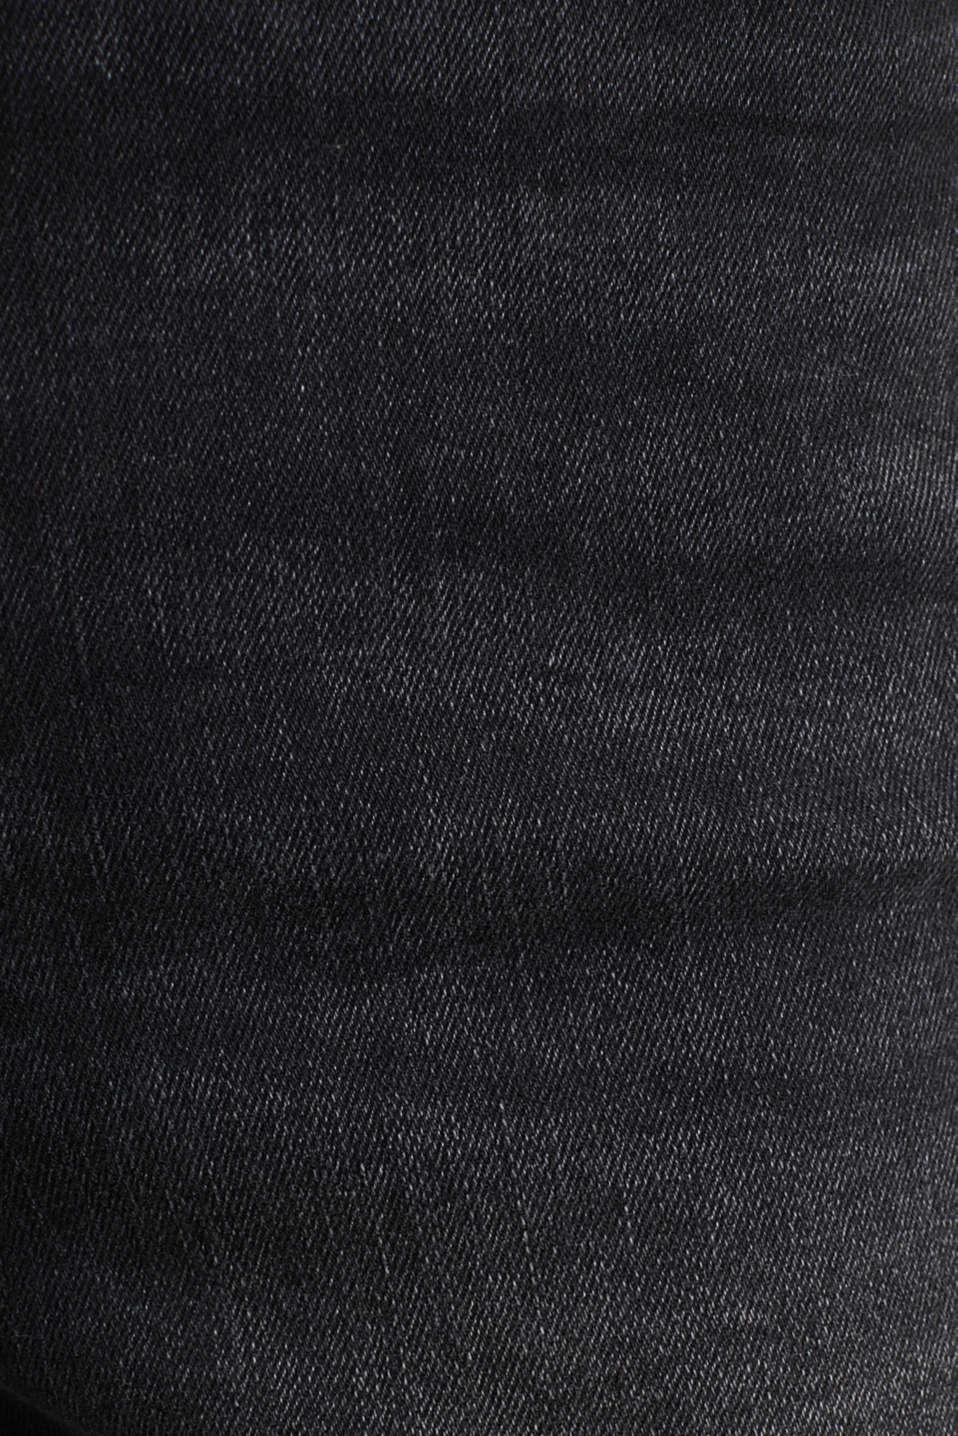 Double button jeans, BLACK DARK WASH, detail image number 4